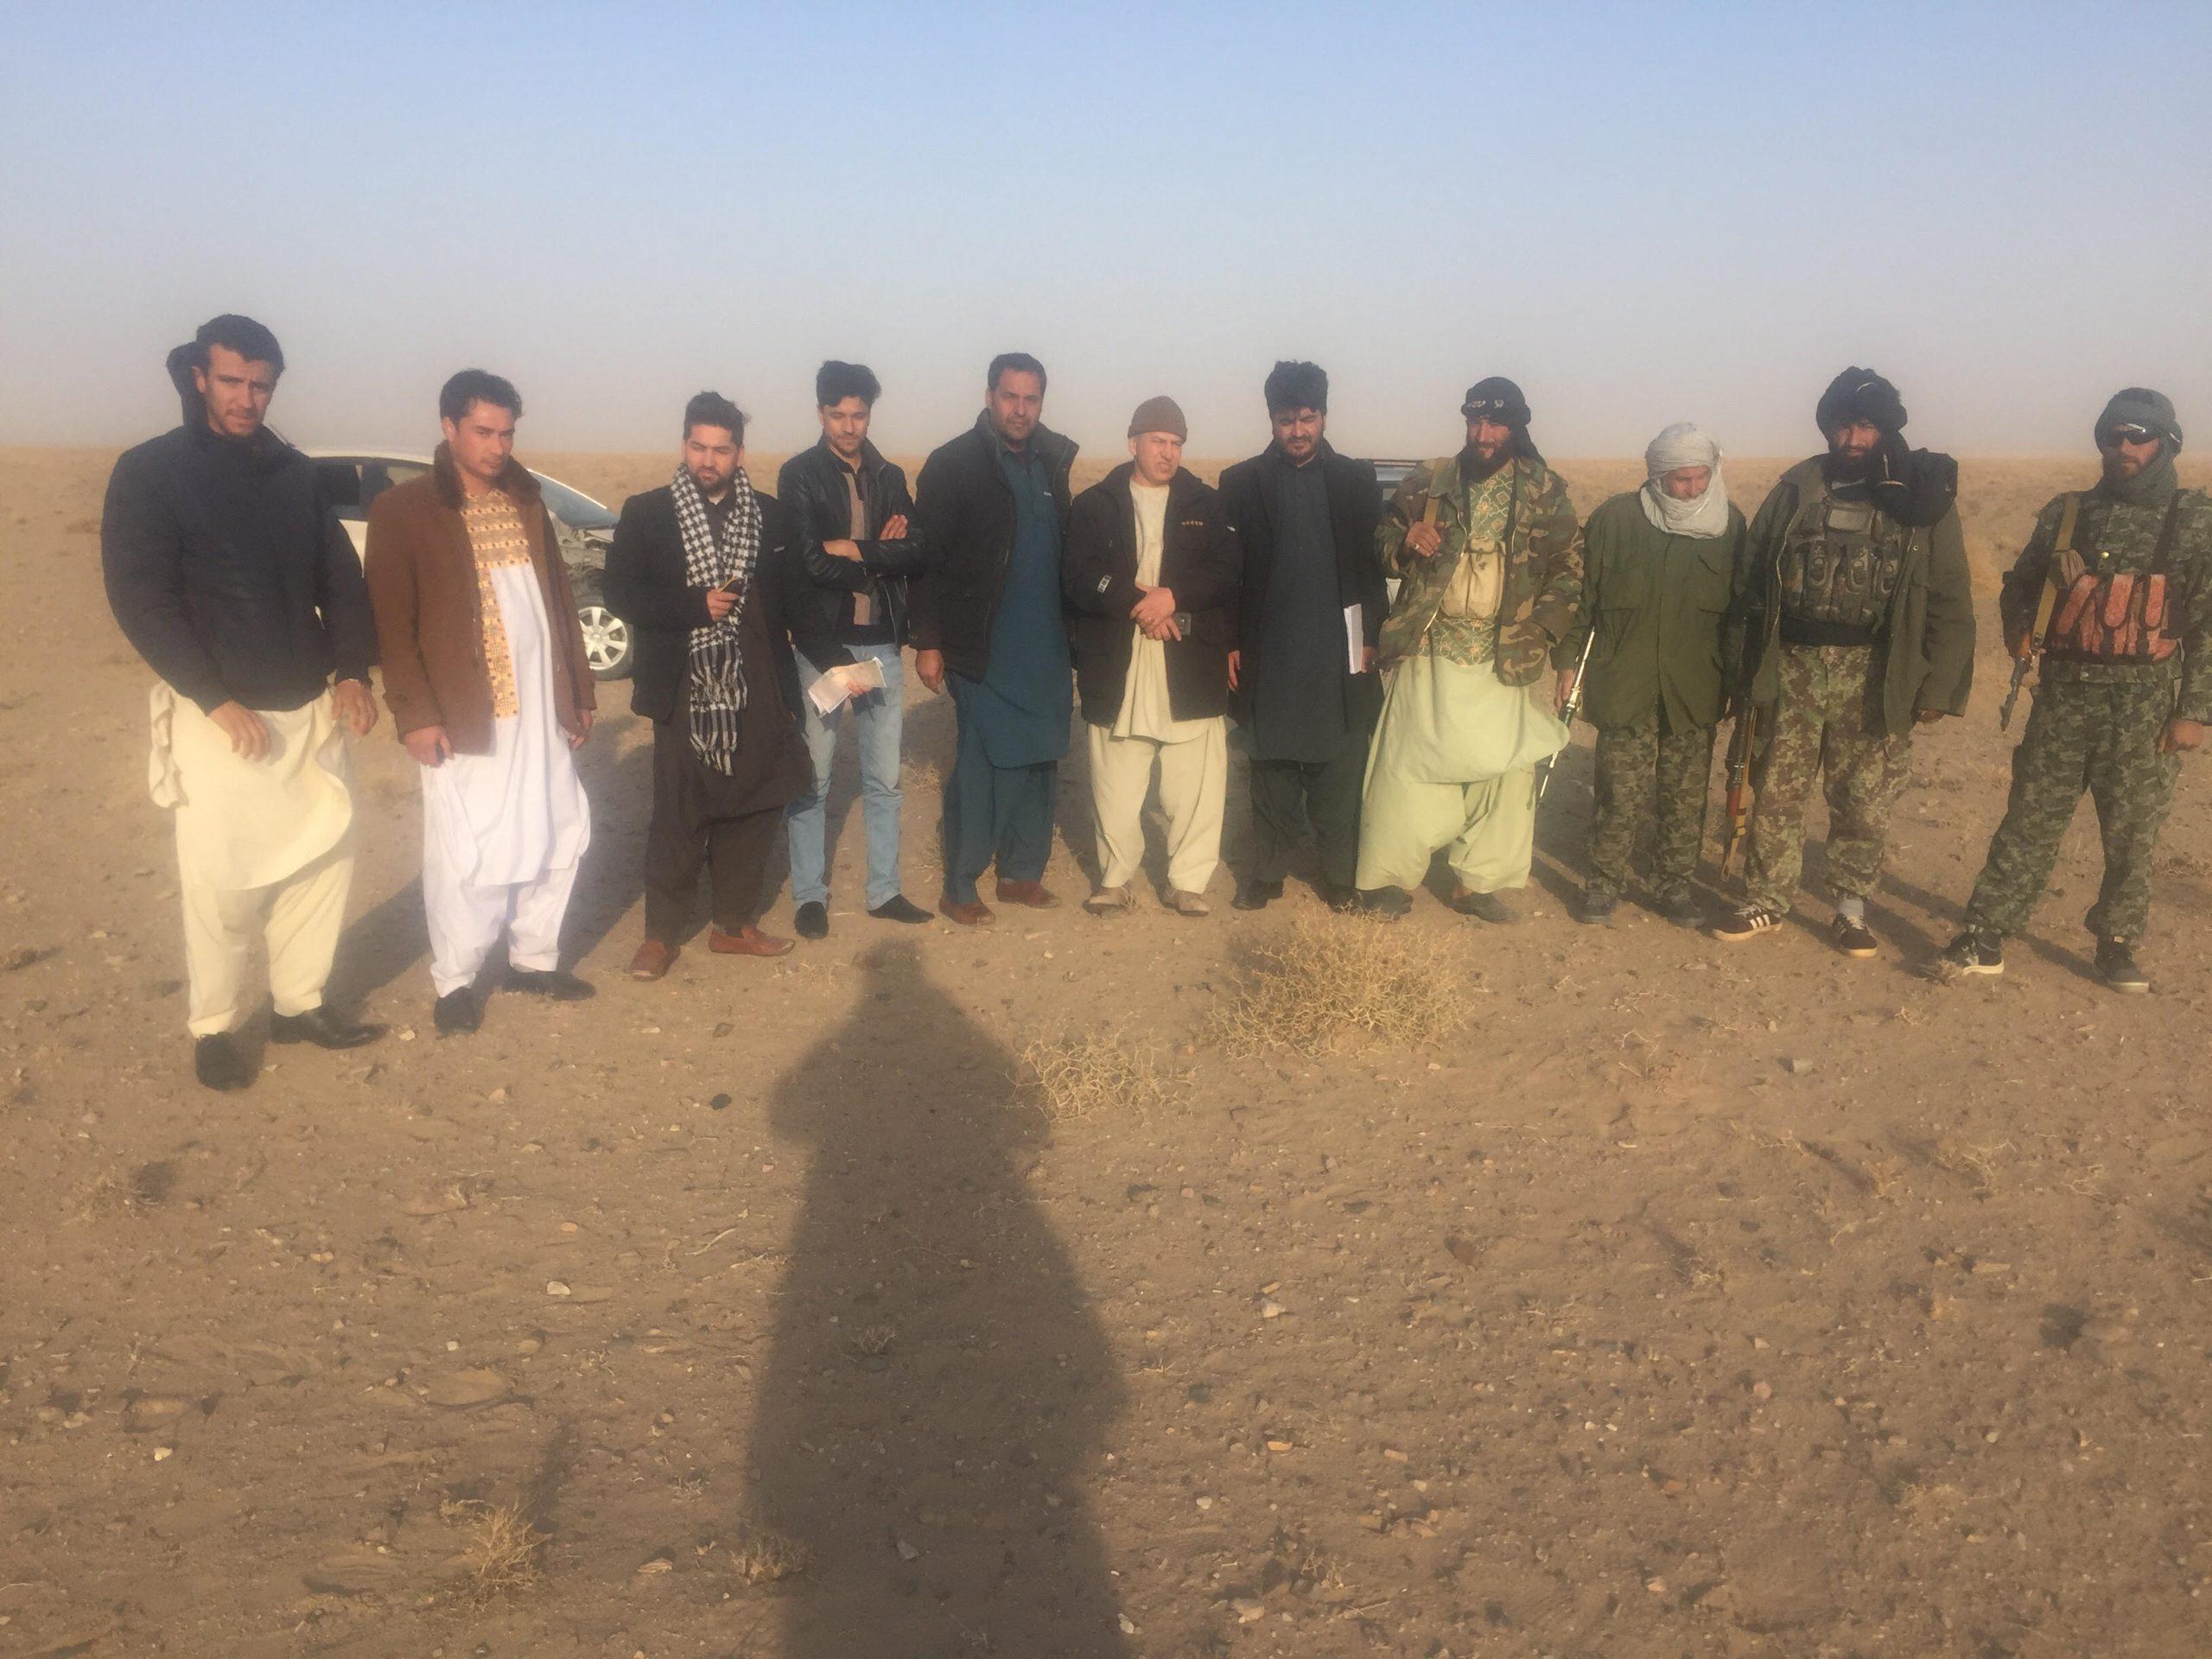 DV-VICC-Teams-at-Guzara-District-of-Herat